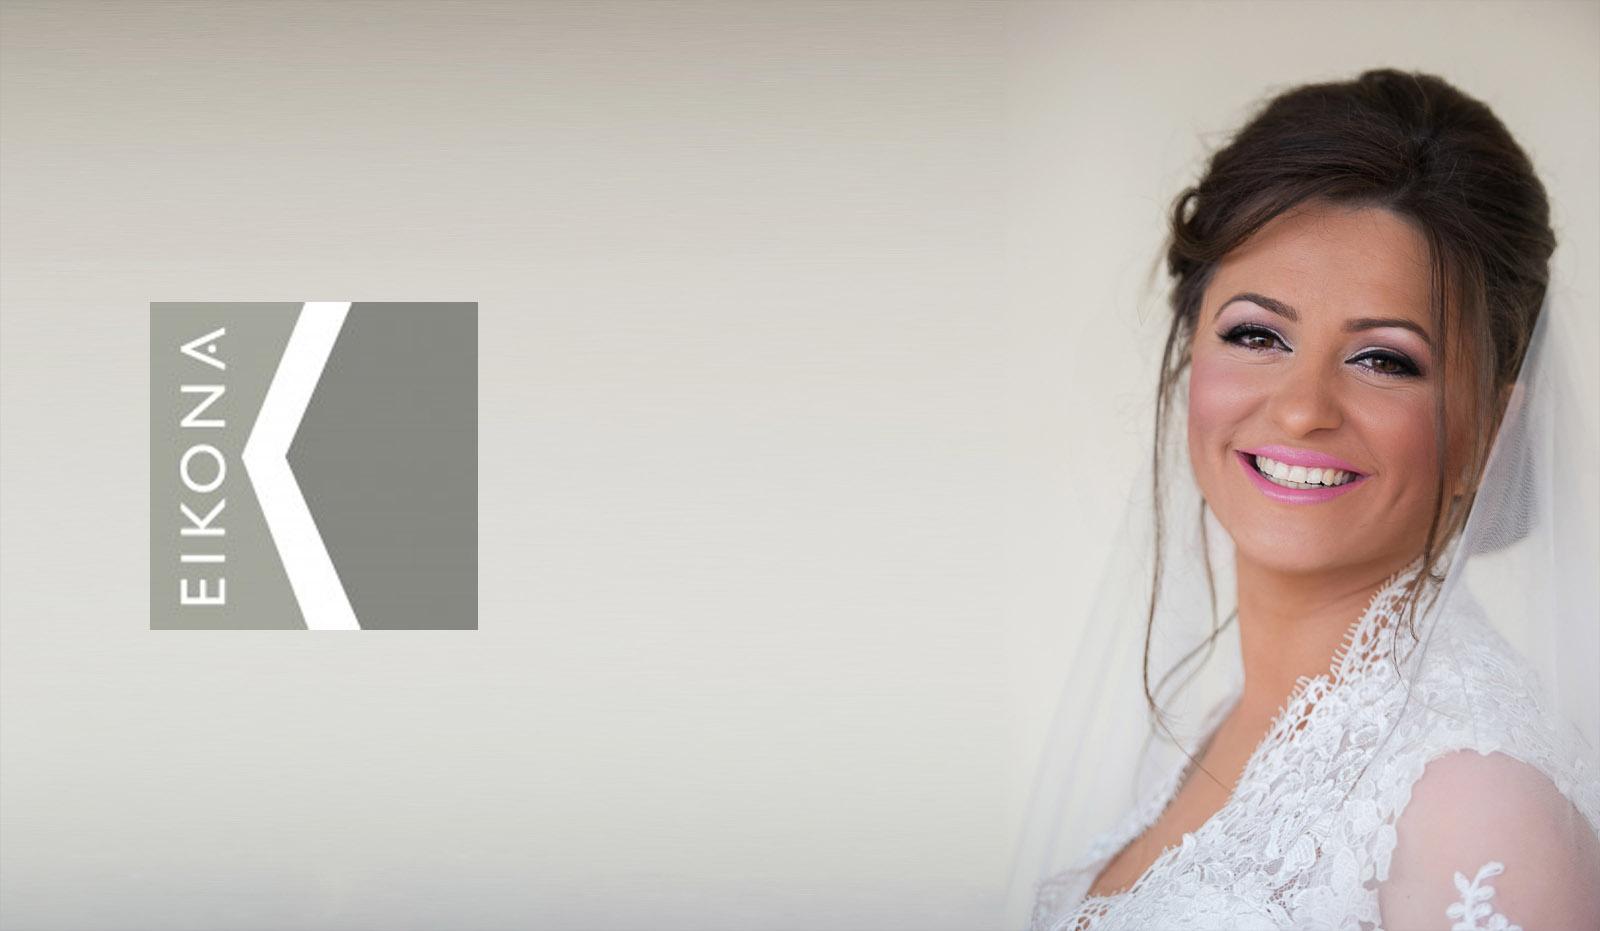 Bride portrait by stavrula stavraka - Foto Eikona Lefkada